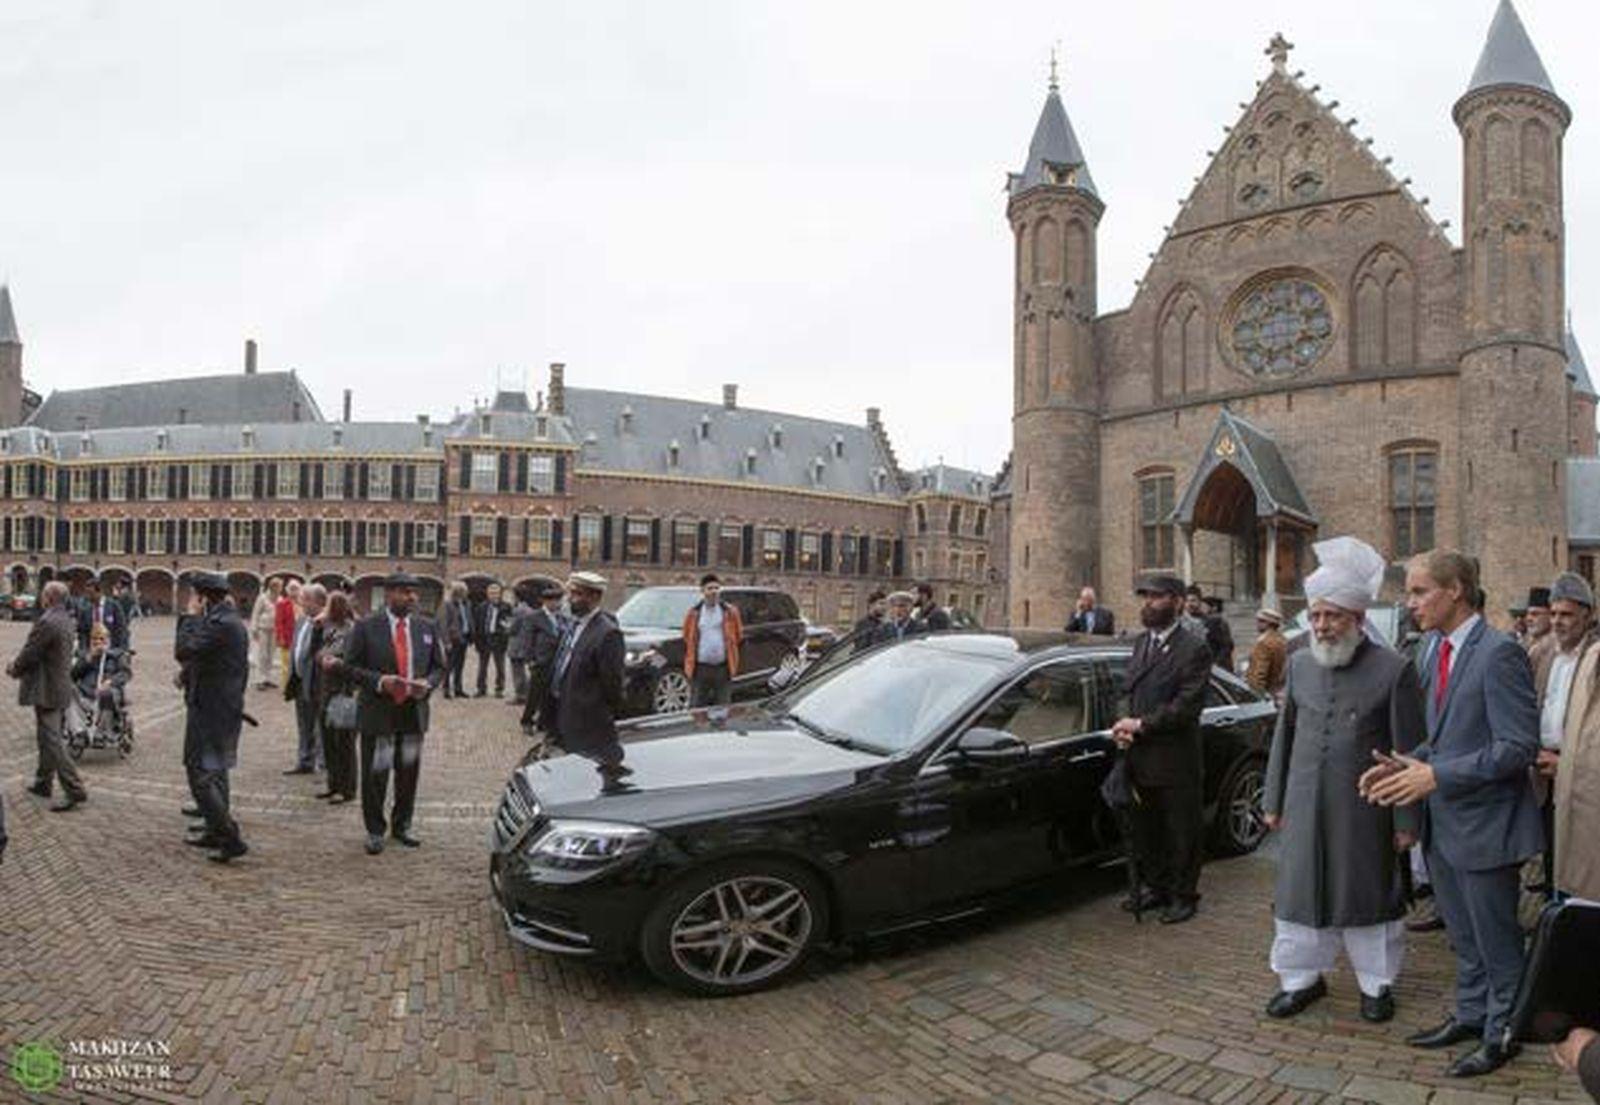 2015-10-06-NLD-Hage-parlamenti-i-holandes-013